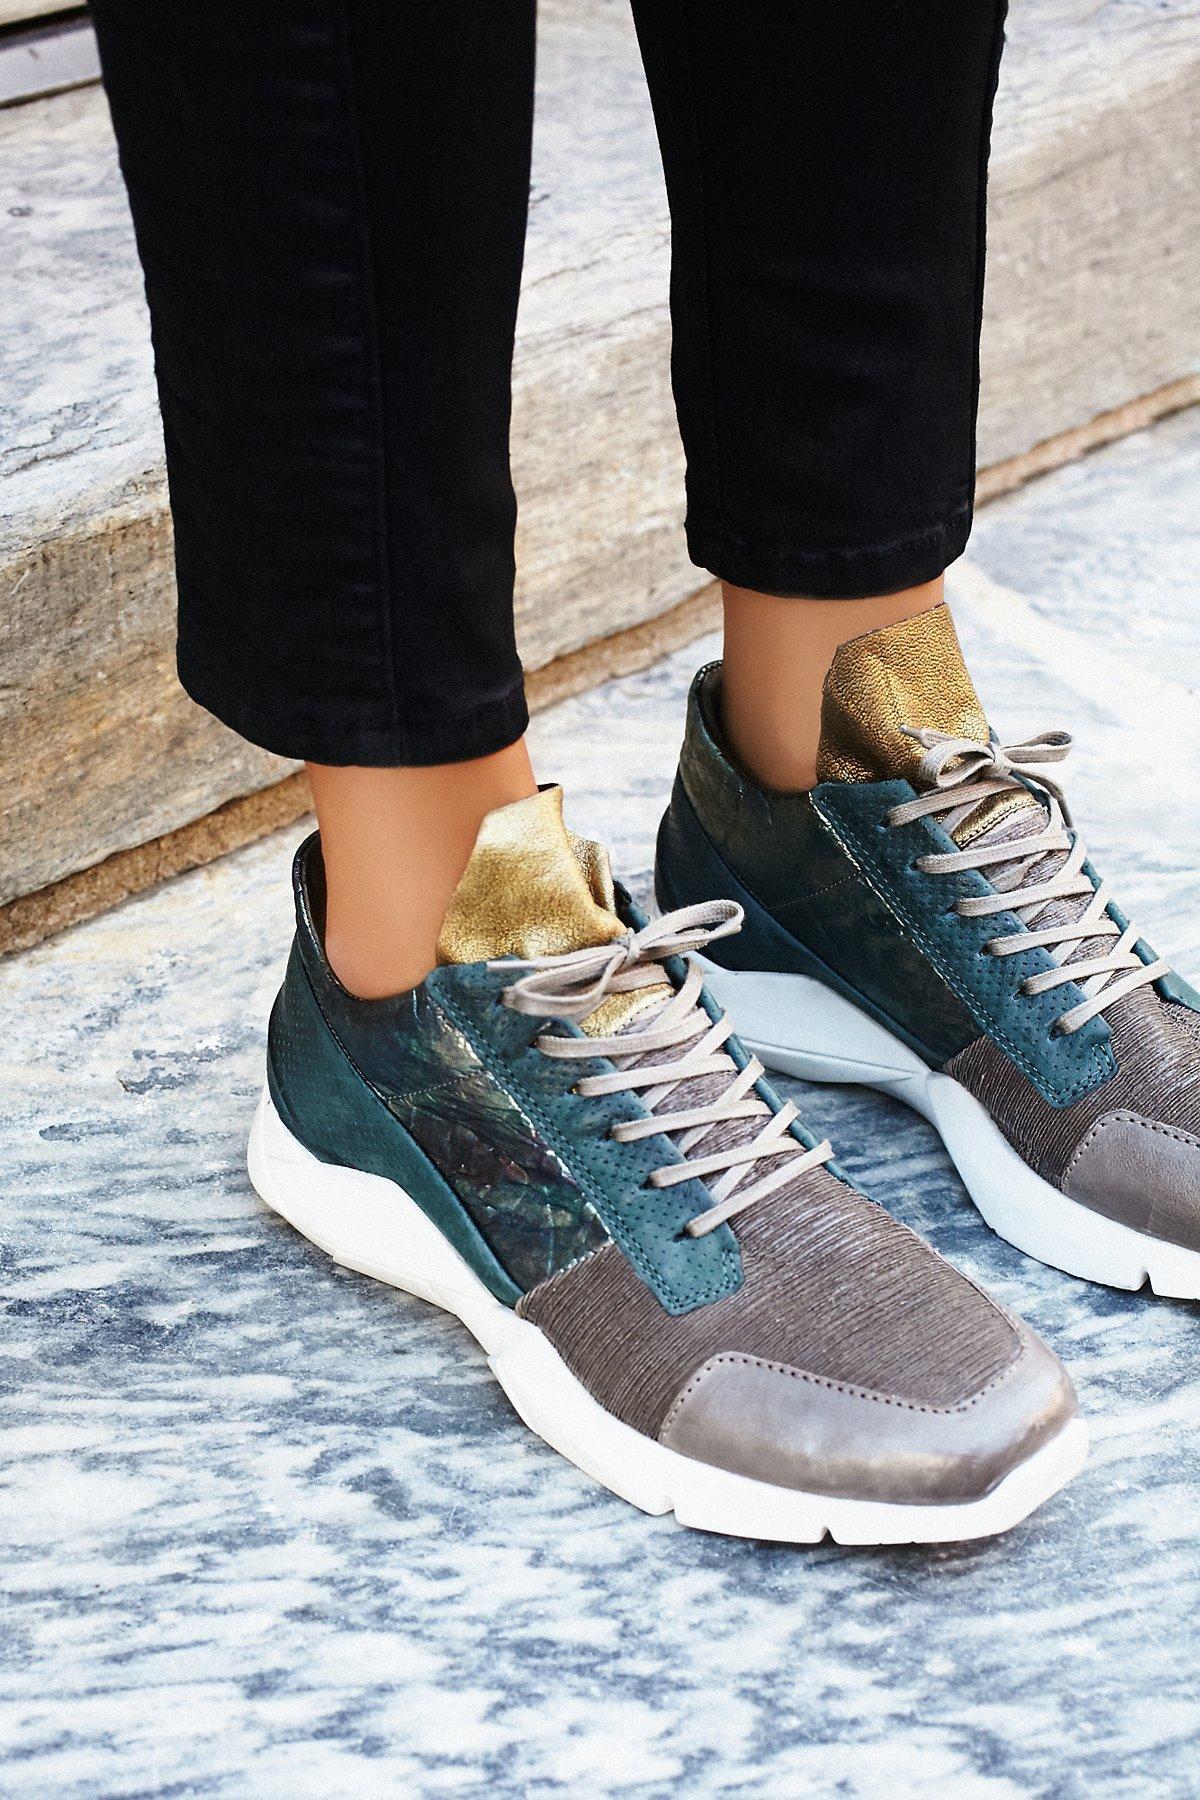 Silver-Throne运动鞋